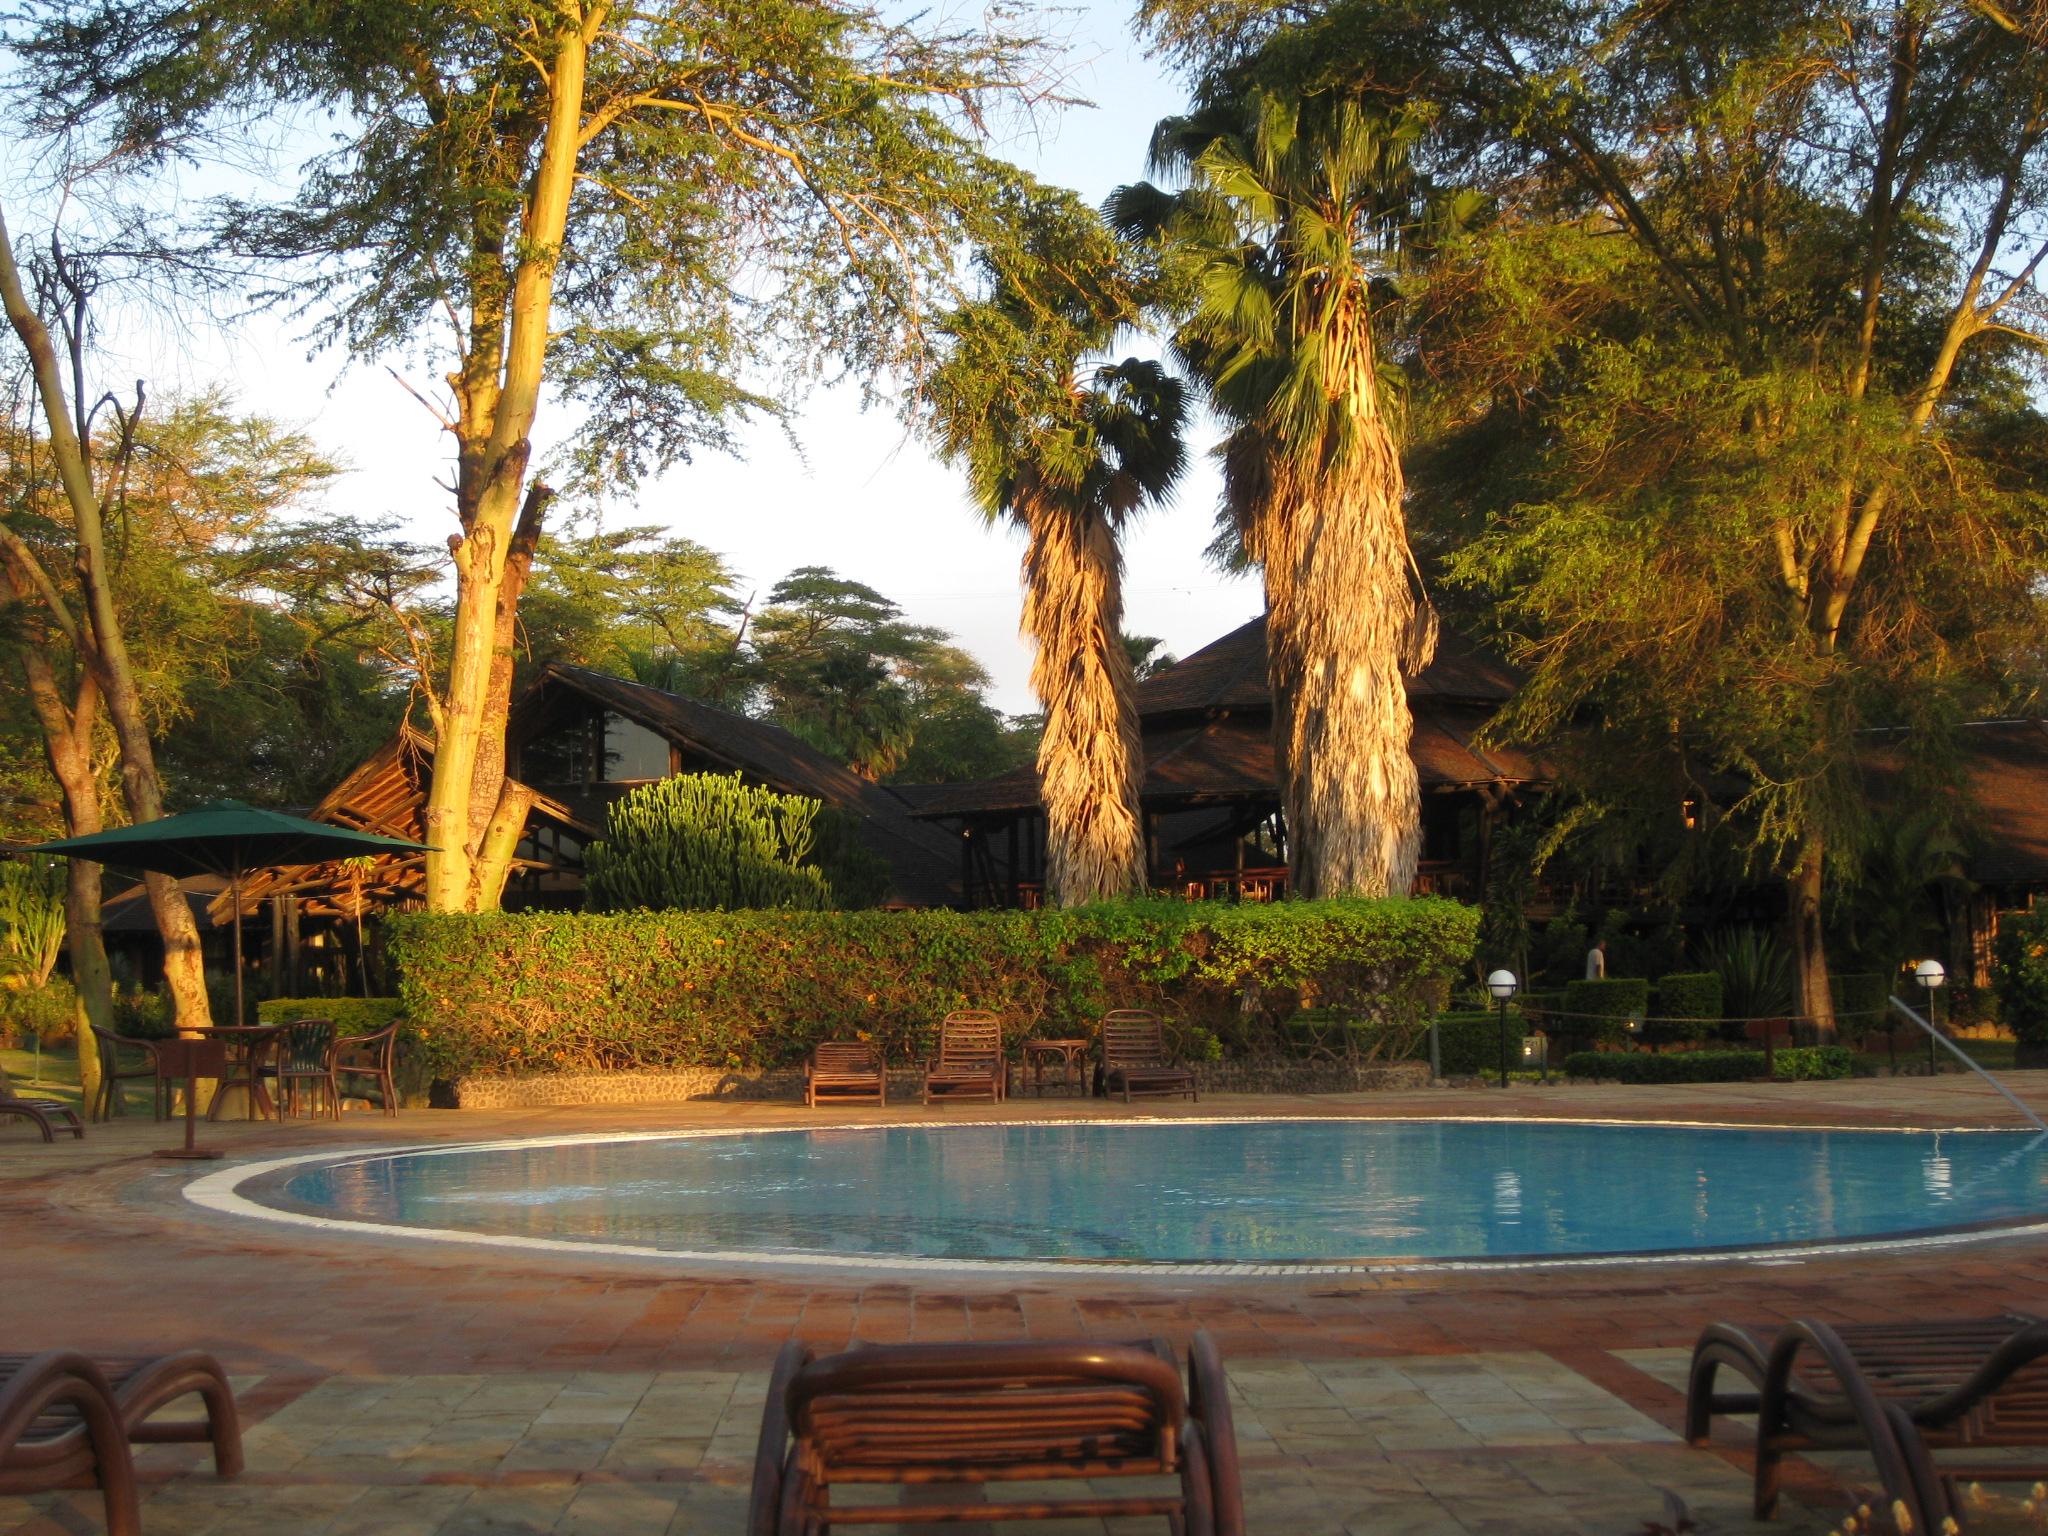 Kenia_2012_422